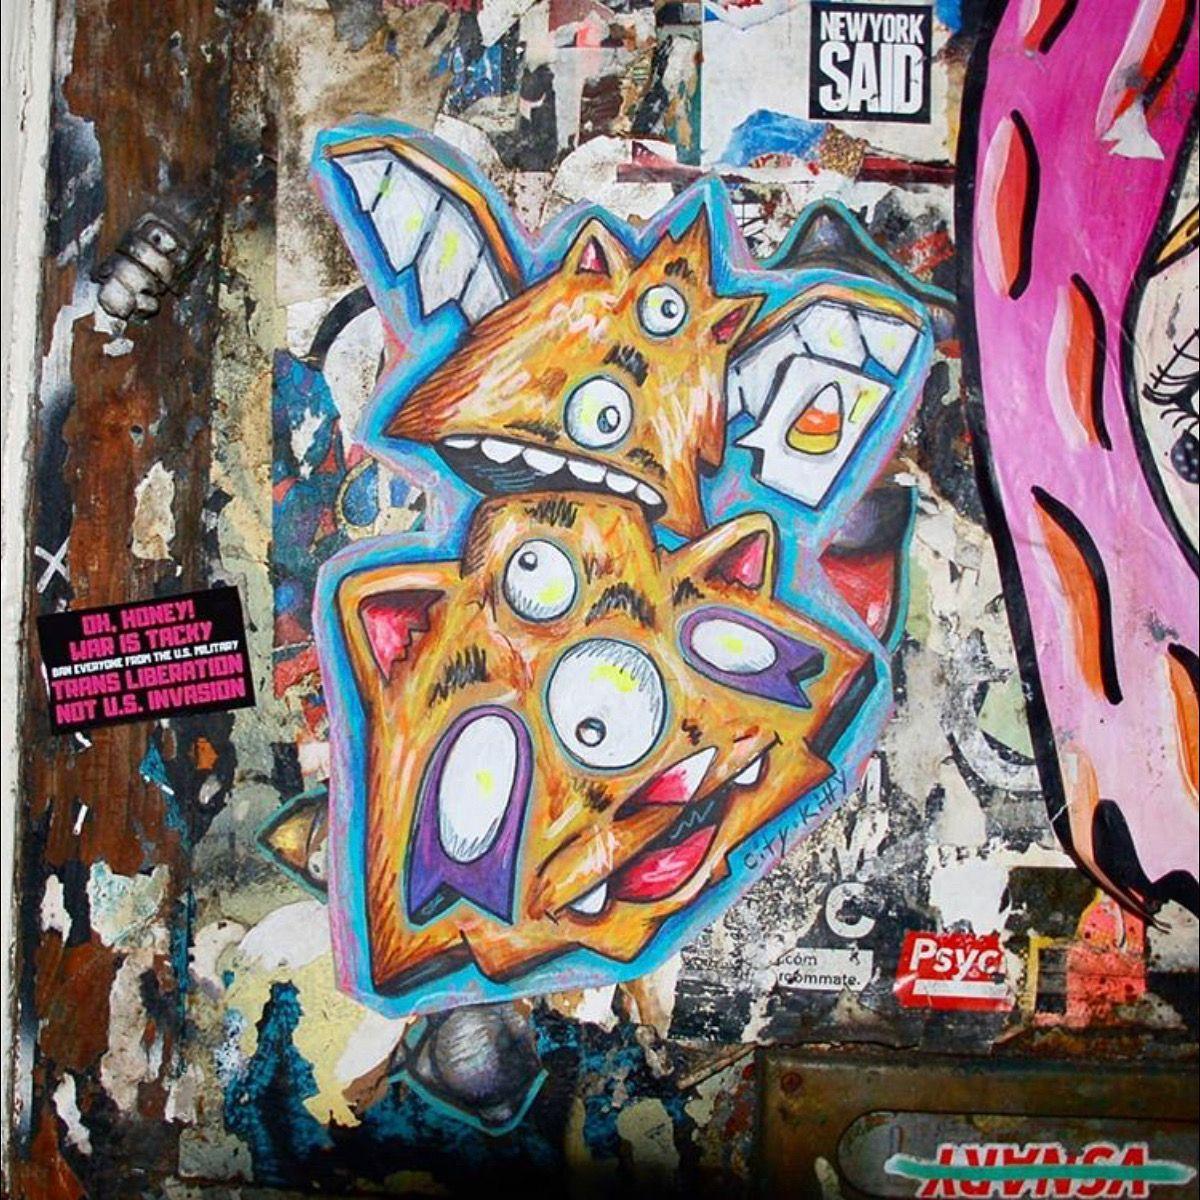 #ART #ArtPhotography #Travel #Explore #CityKitty #NY #UrbanArt #Graffiti #StreetArt #8bit #ArtLover #ModernArt #ArtstaGram #PositiveVibes